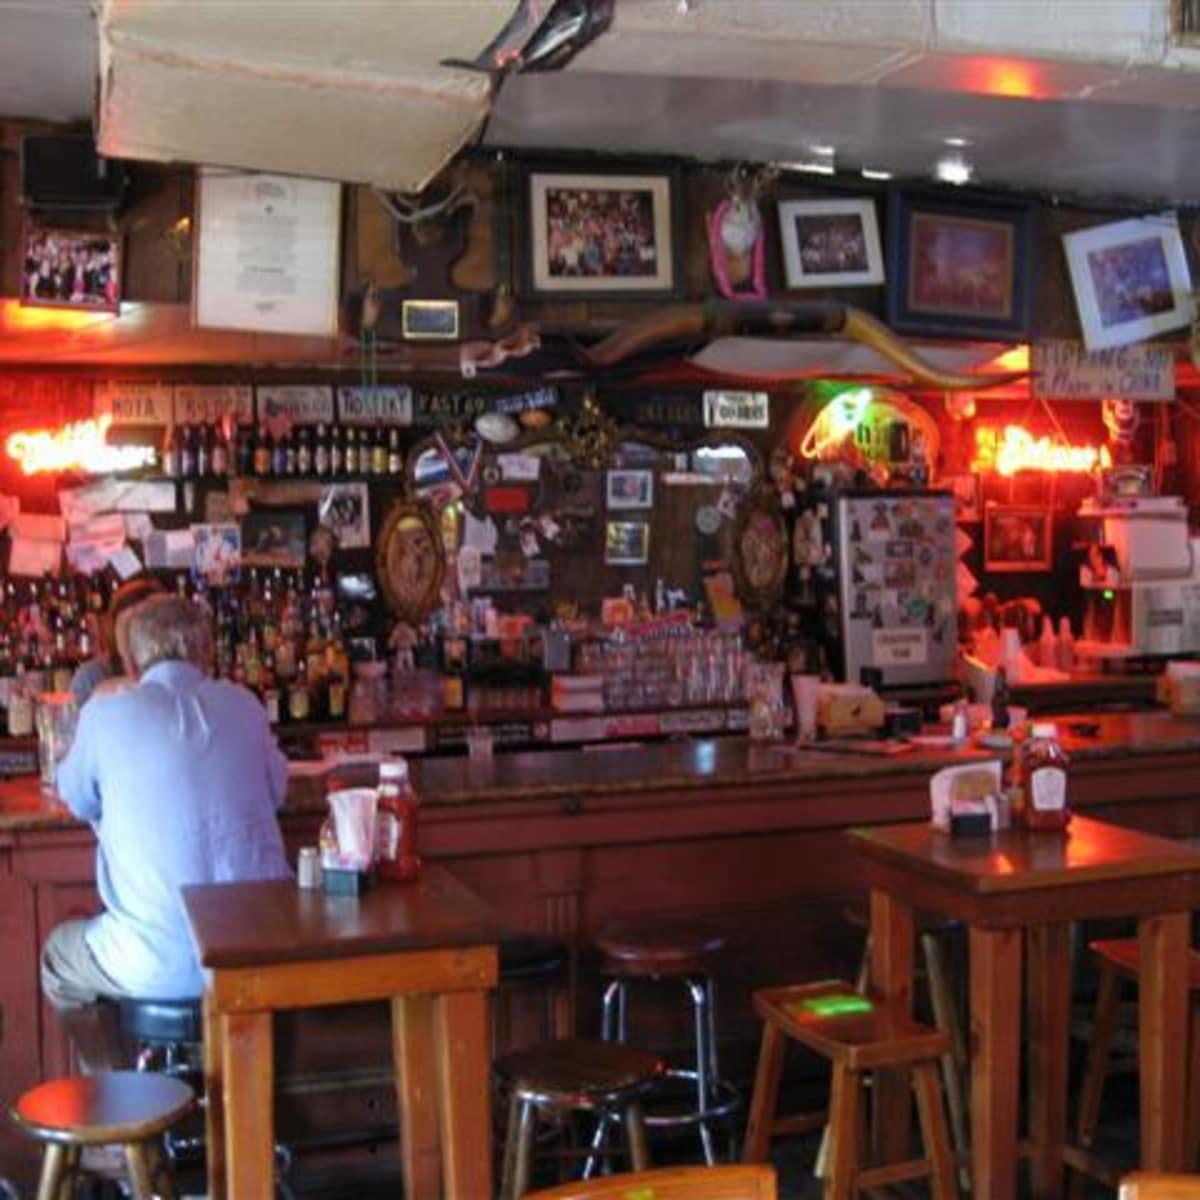 Austin_photo: places_food_texaschiliparlor_interior